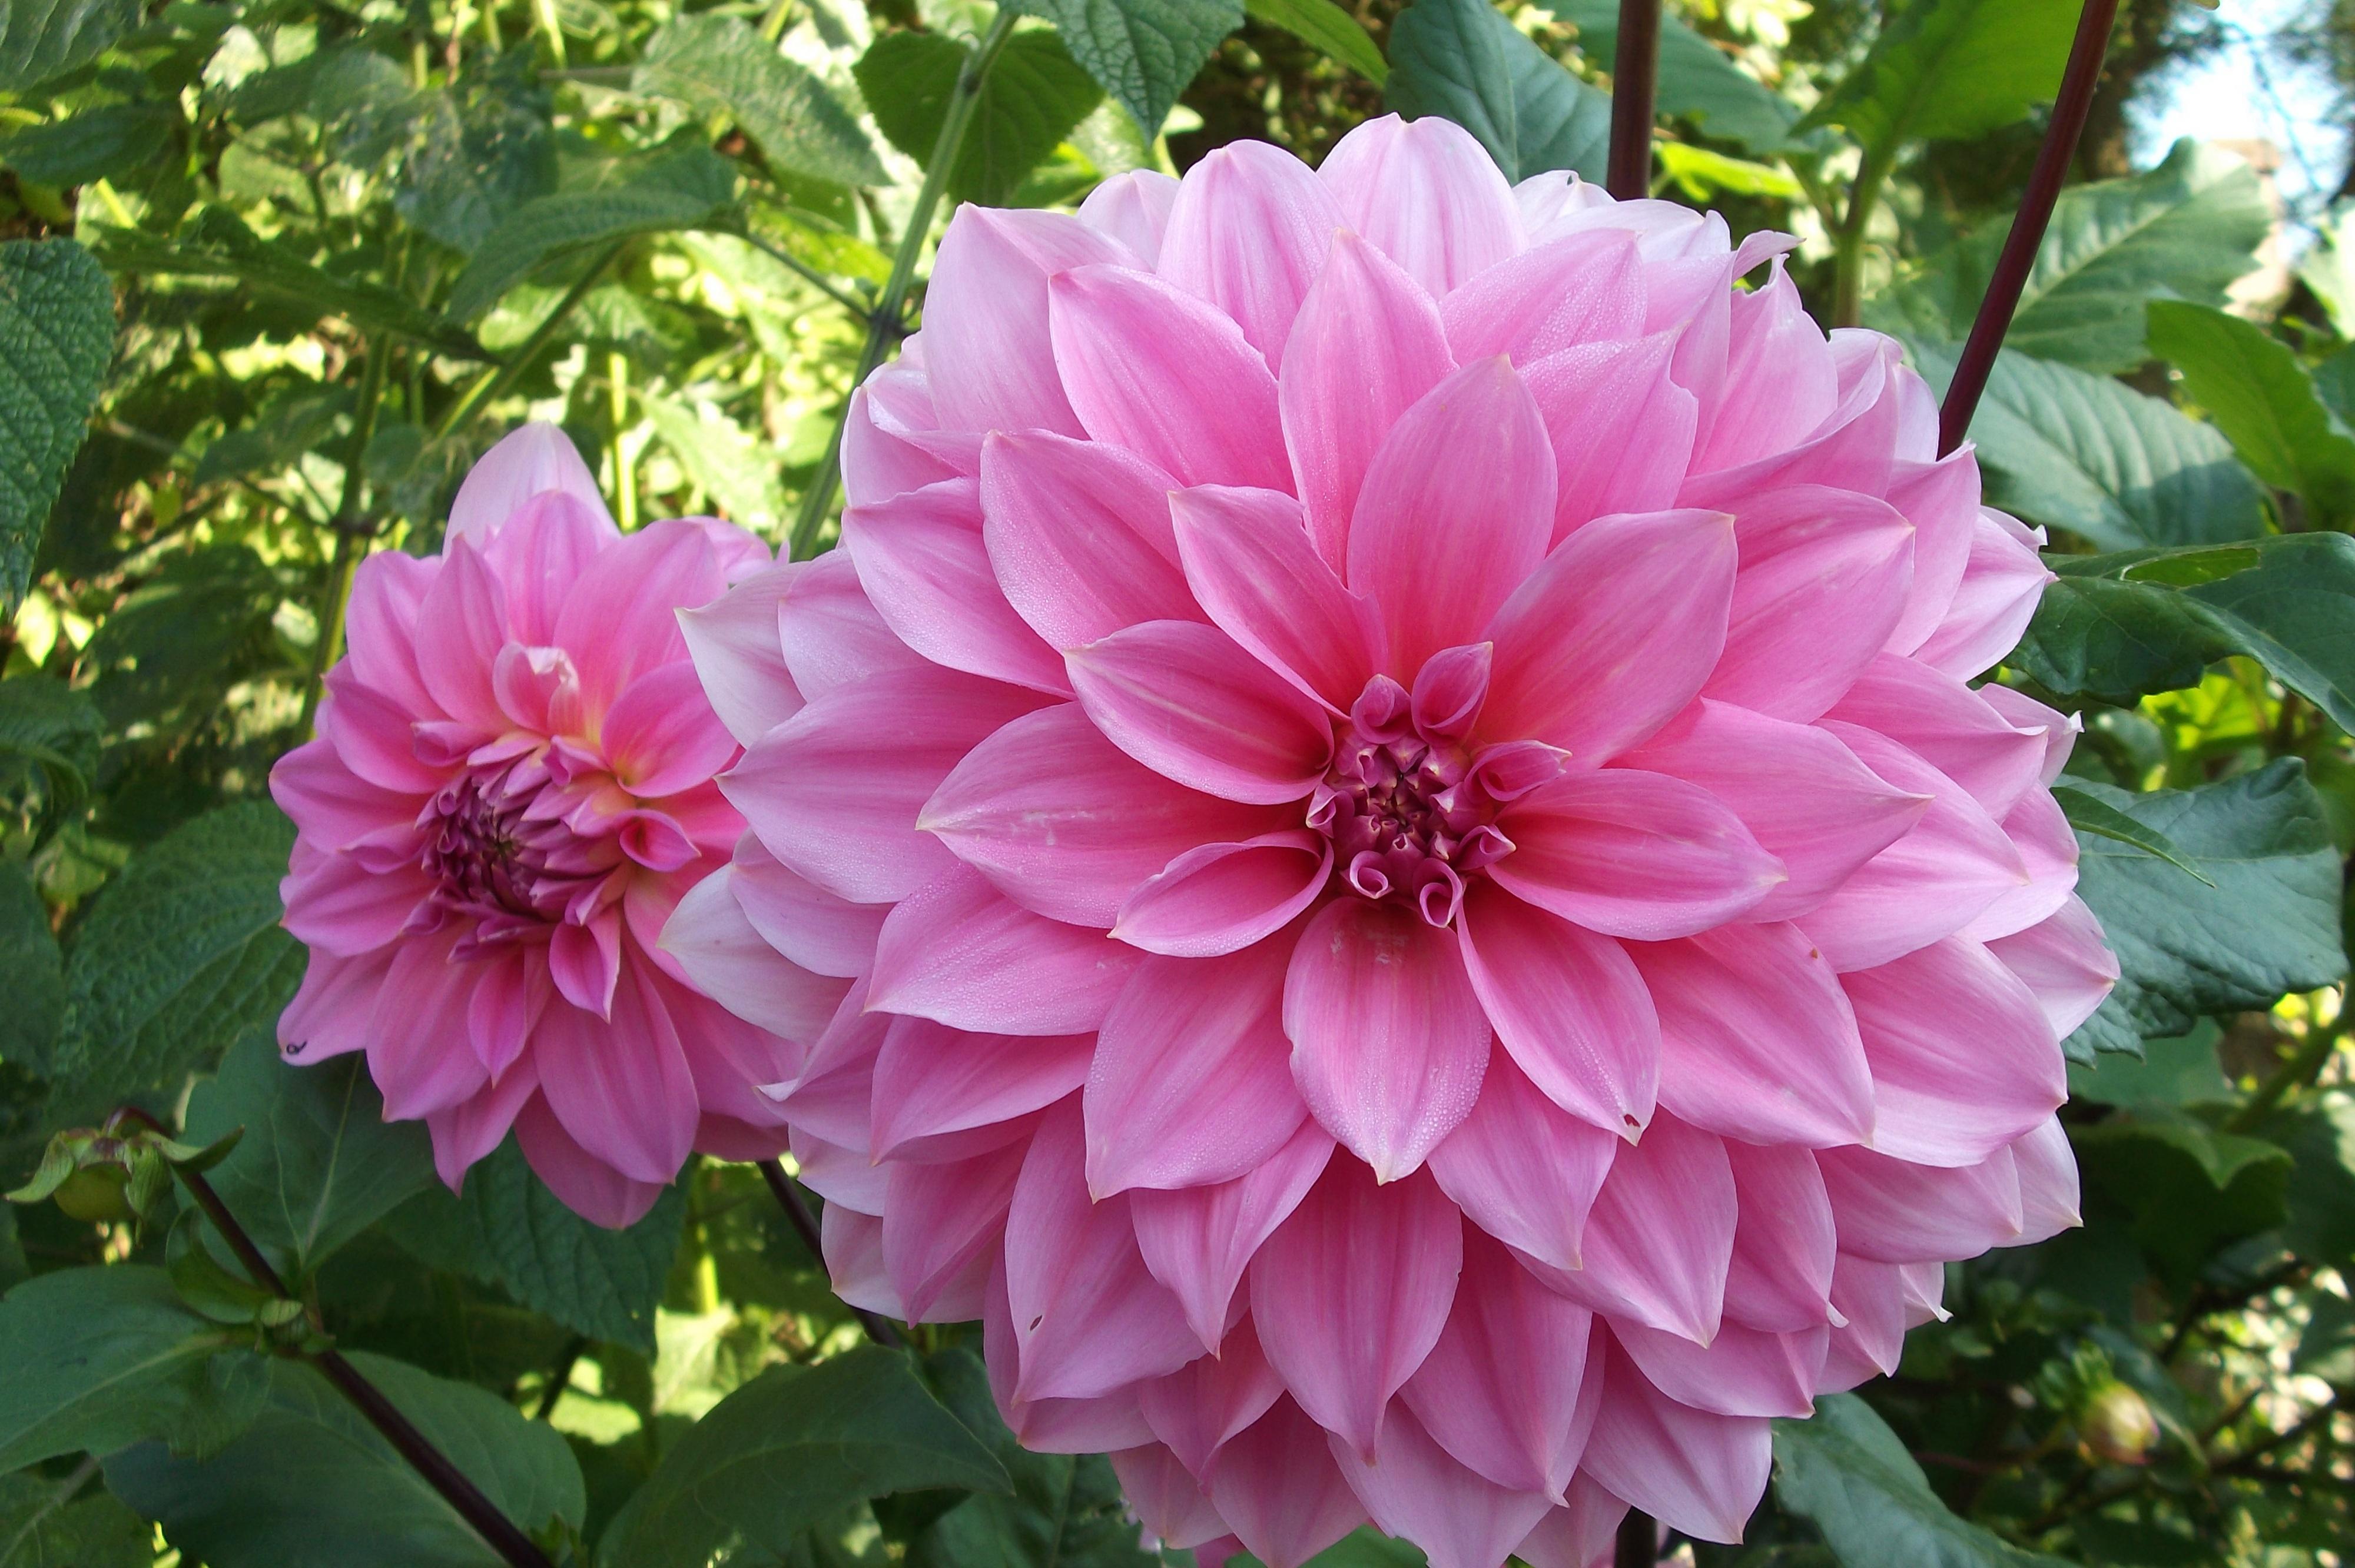 Free Images Flower Petal Garden Dahlia Peony Pink Flowers